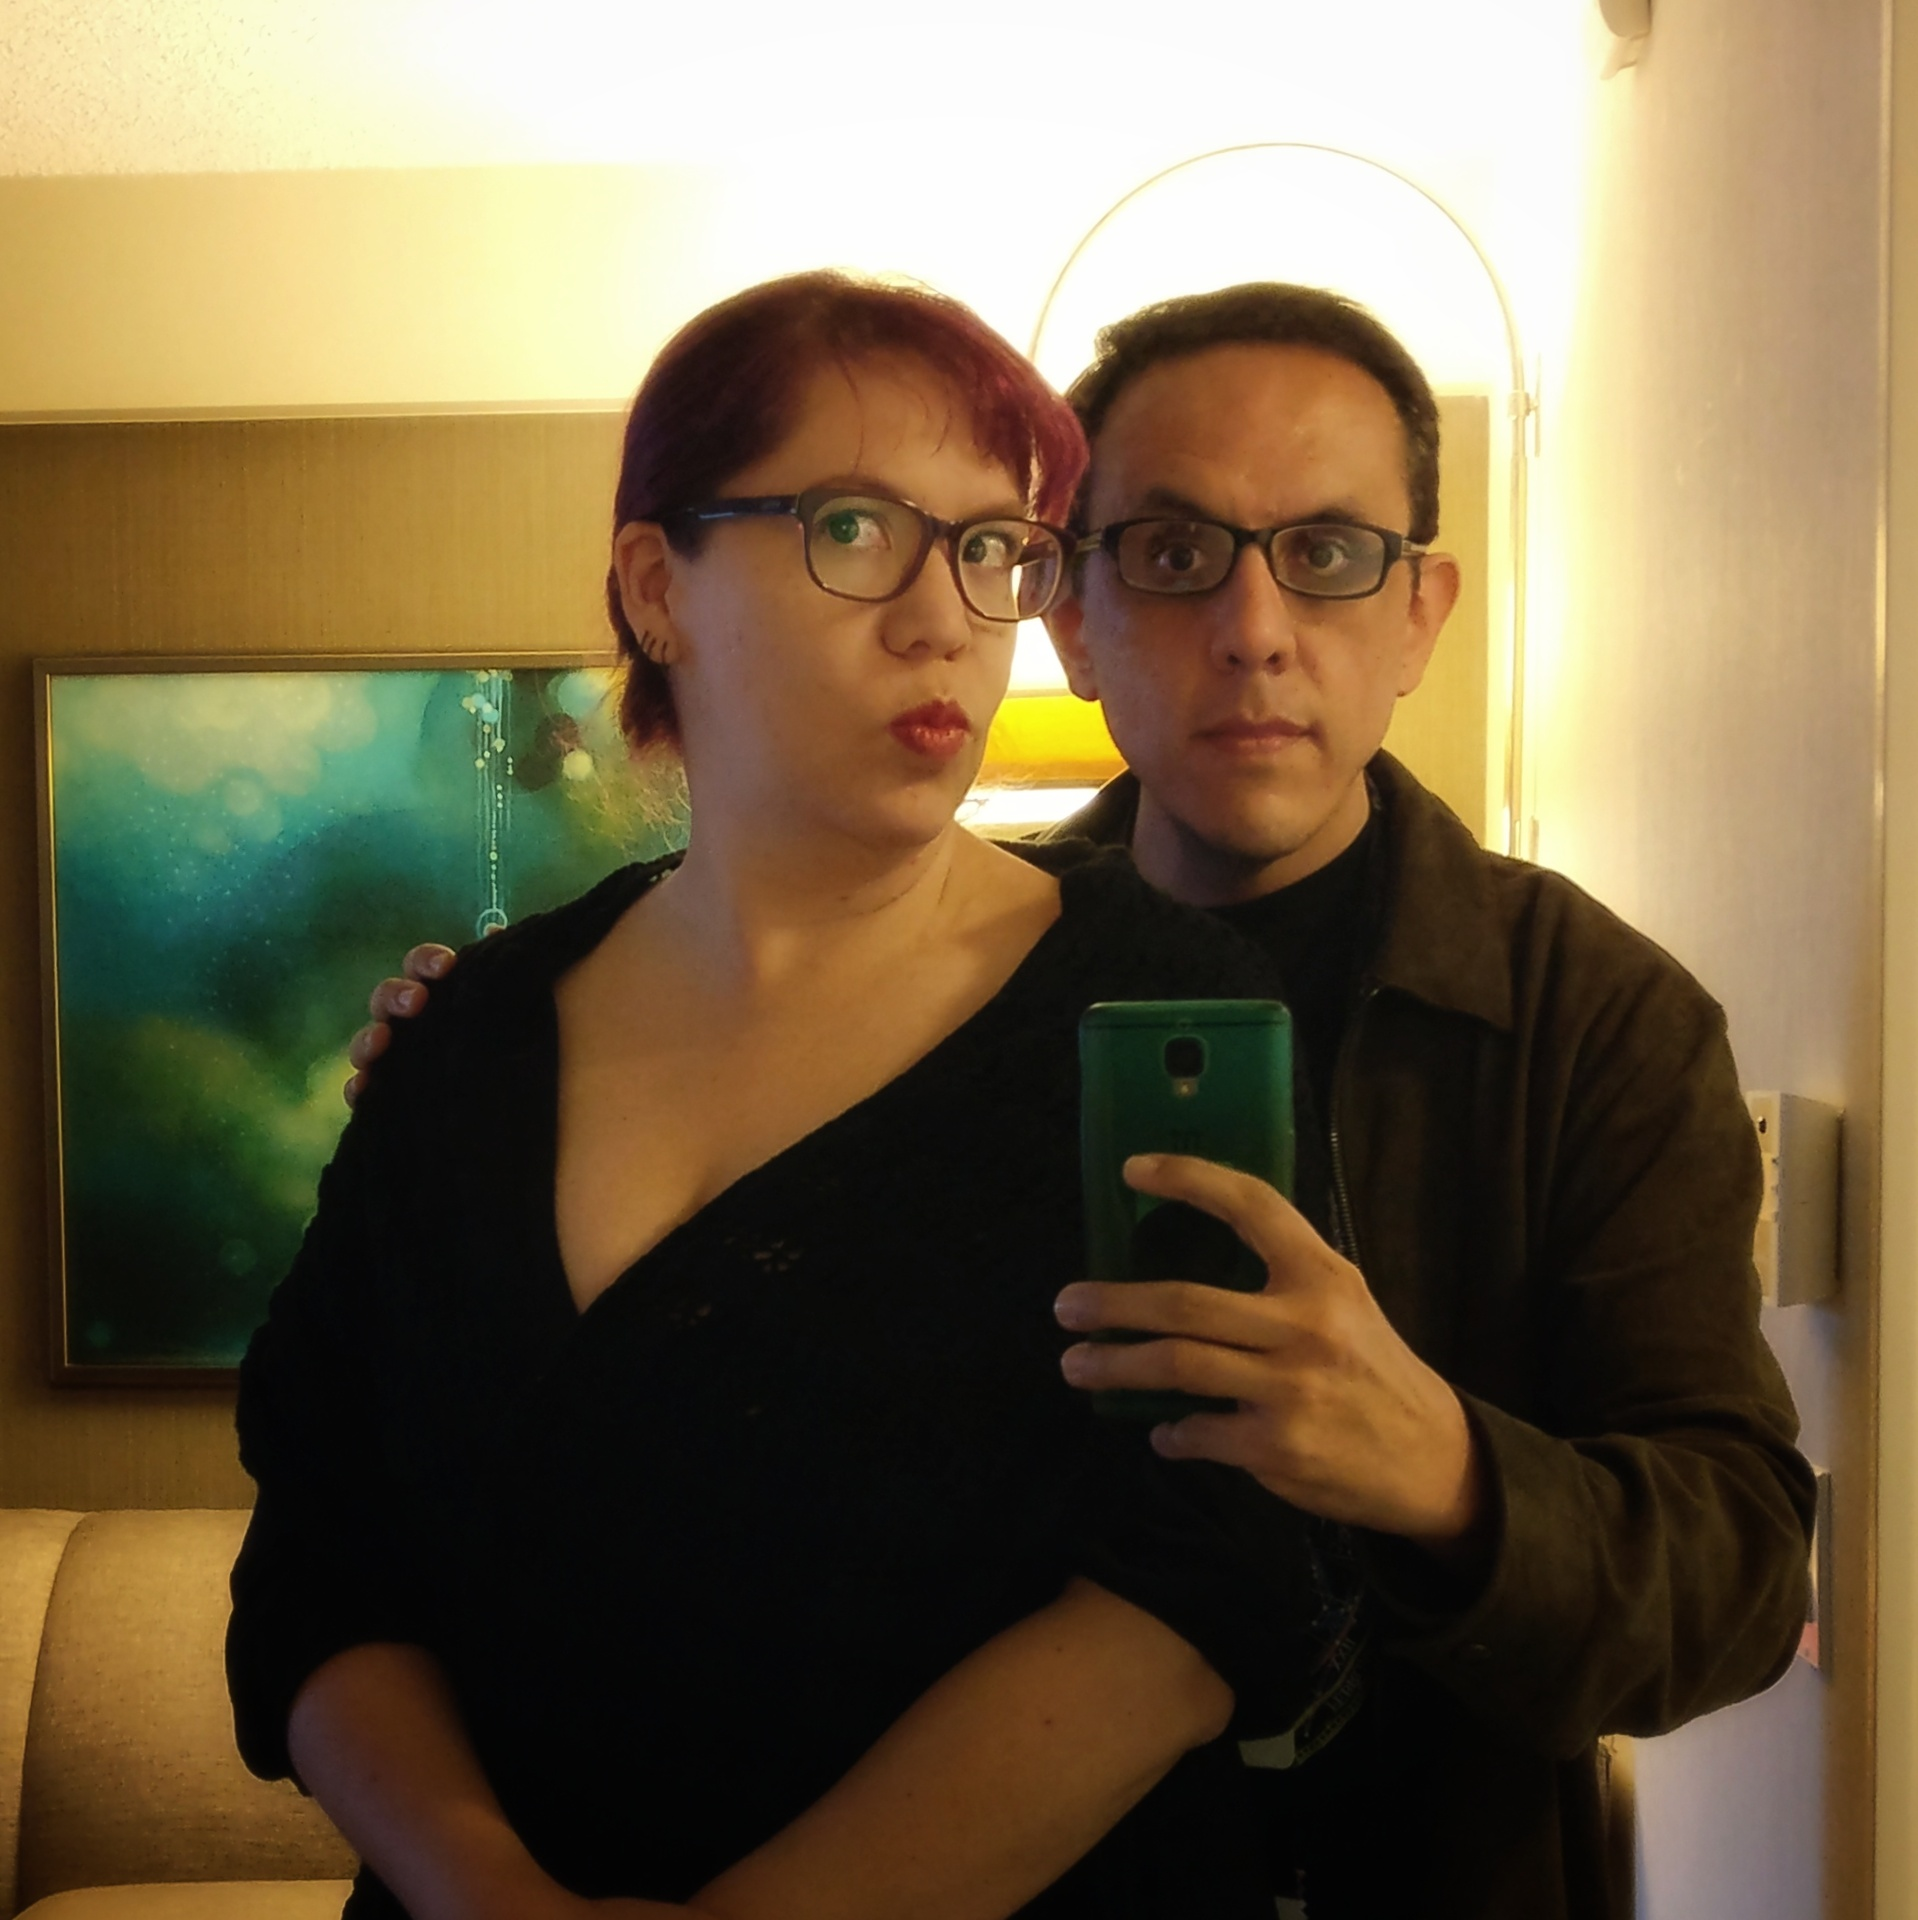 Raquel Castro and Alberto Chimal ready for Hugo night (Photo by Alberto Chimal)